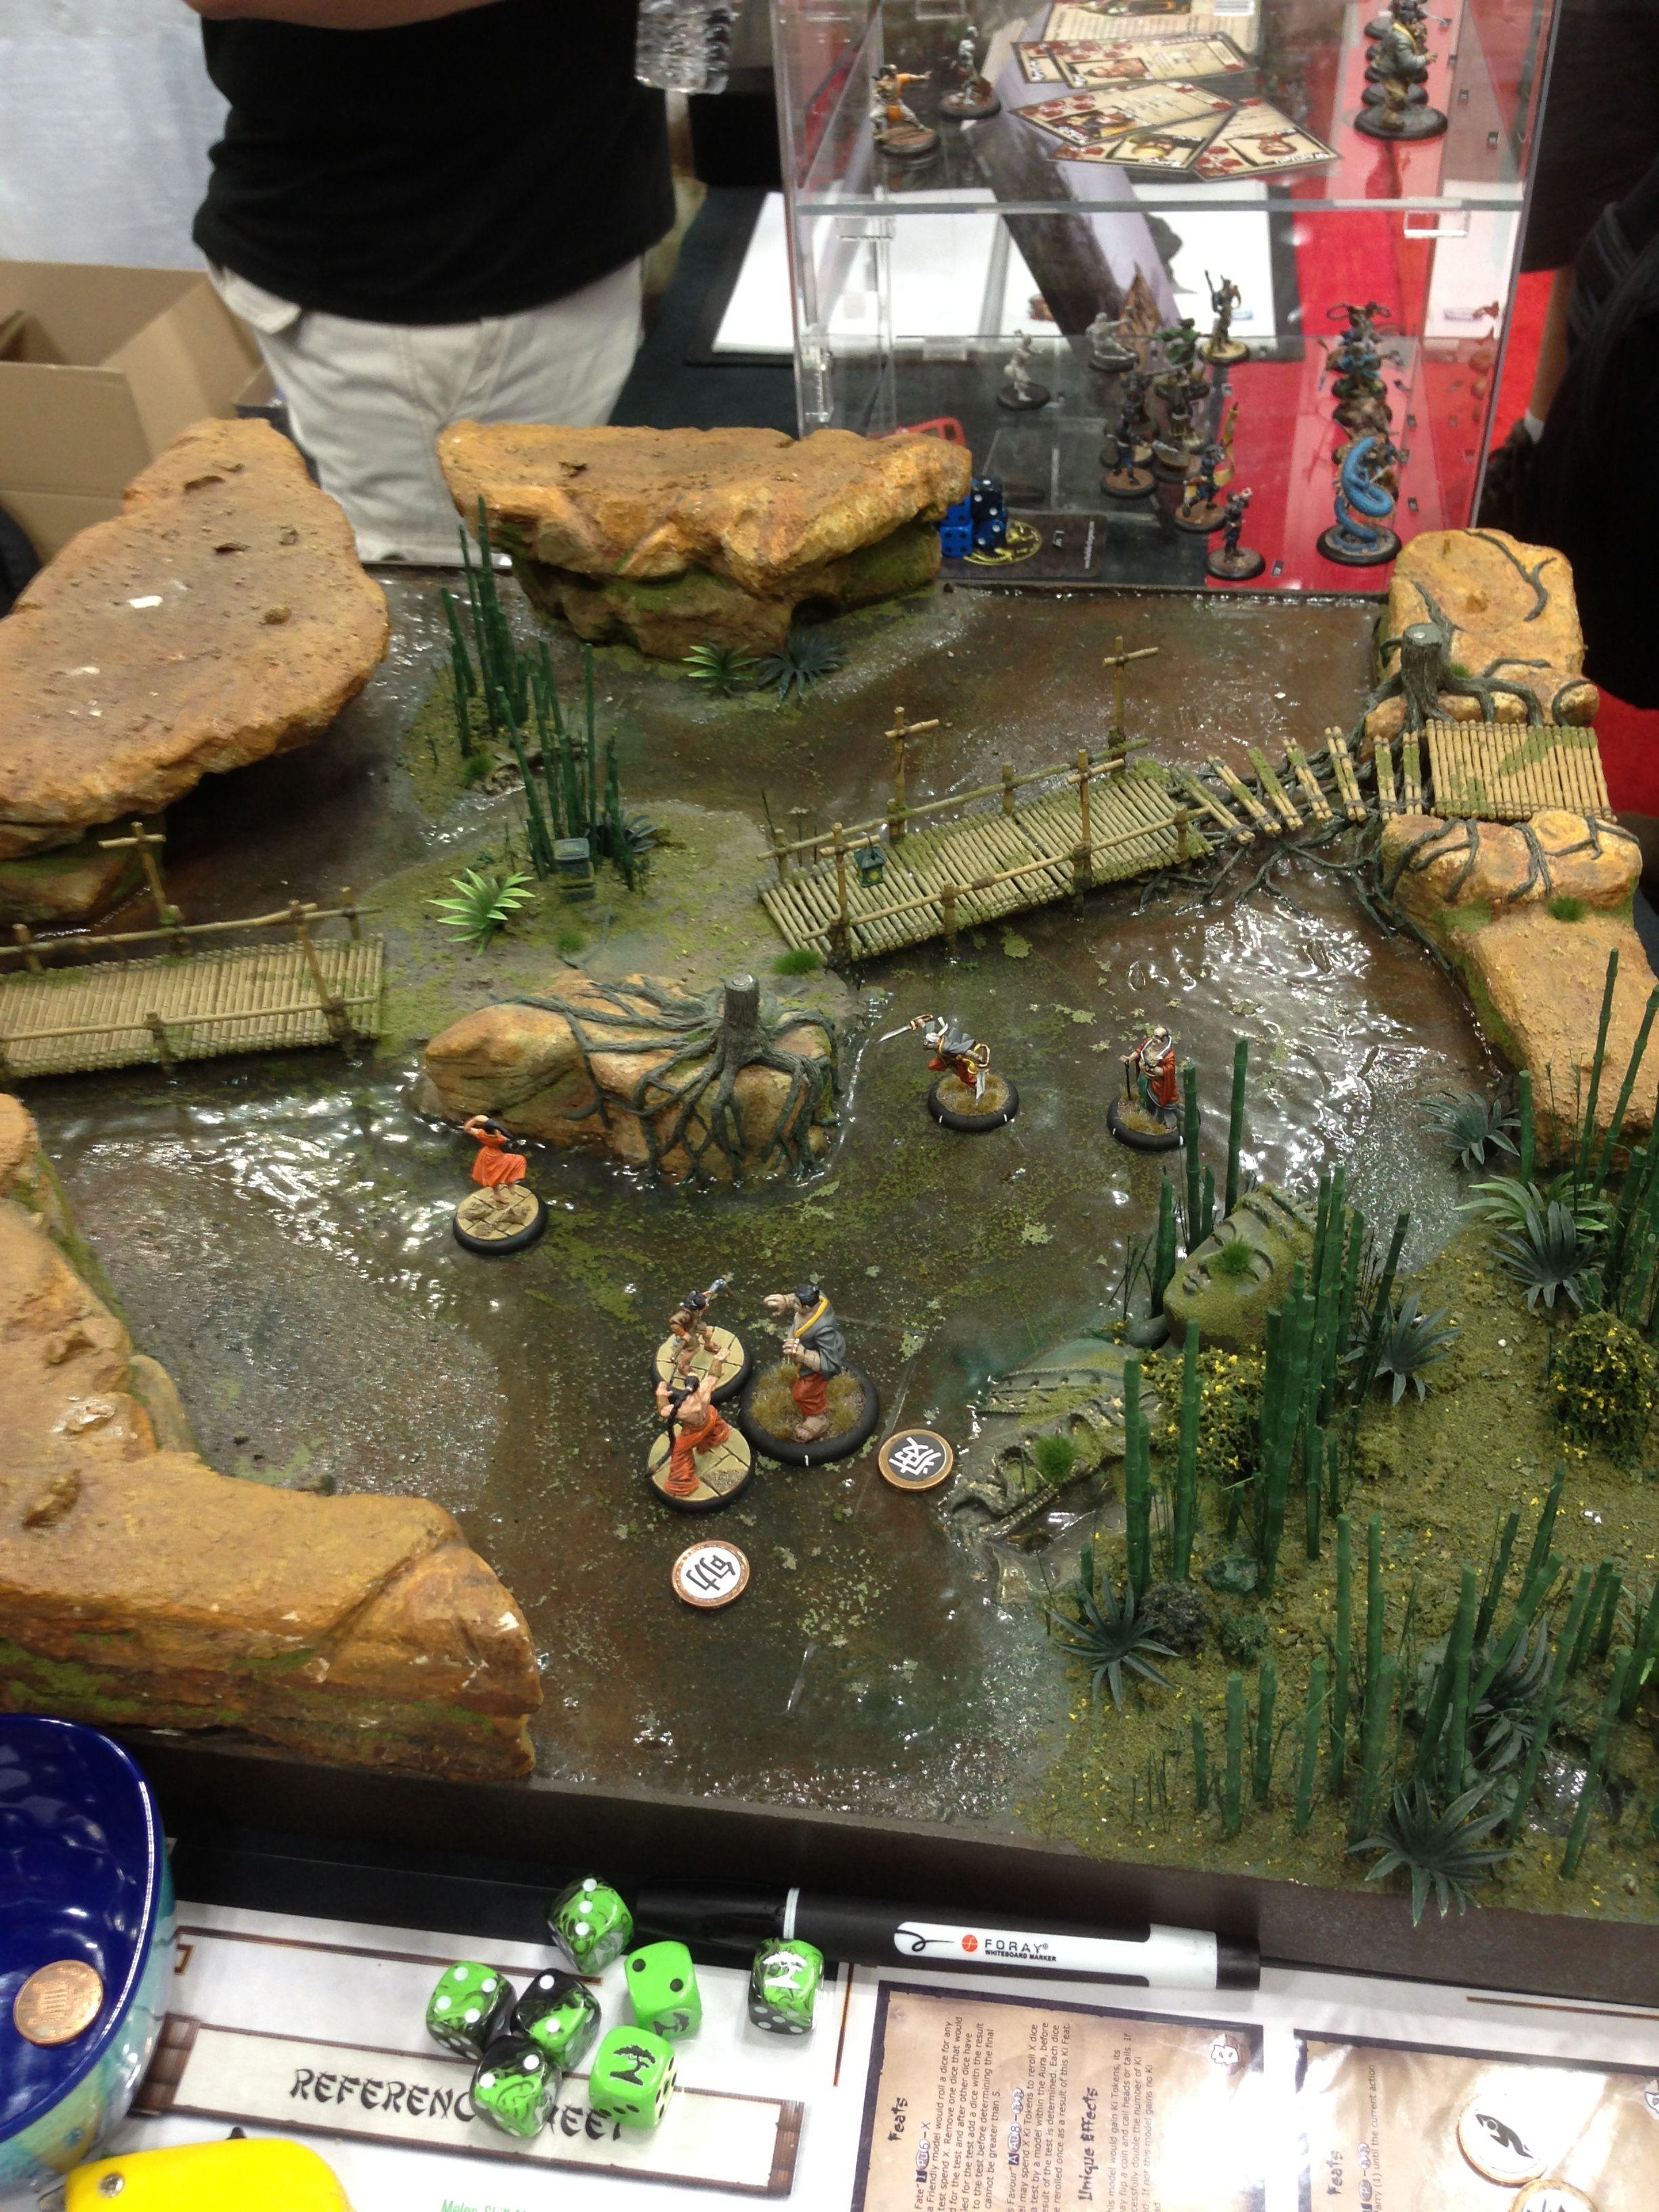 Bushido miniatures skirmish game at GenCon 2013 - love the watery